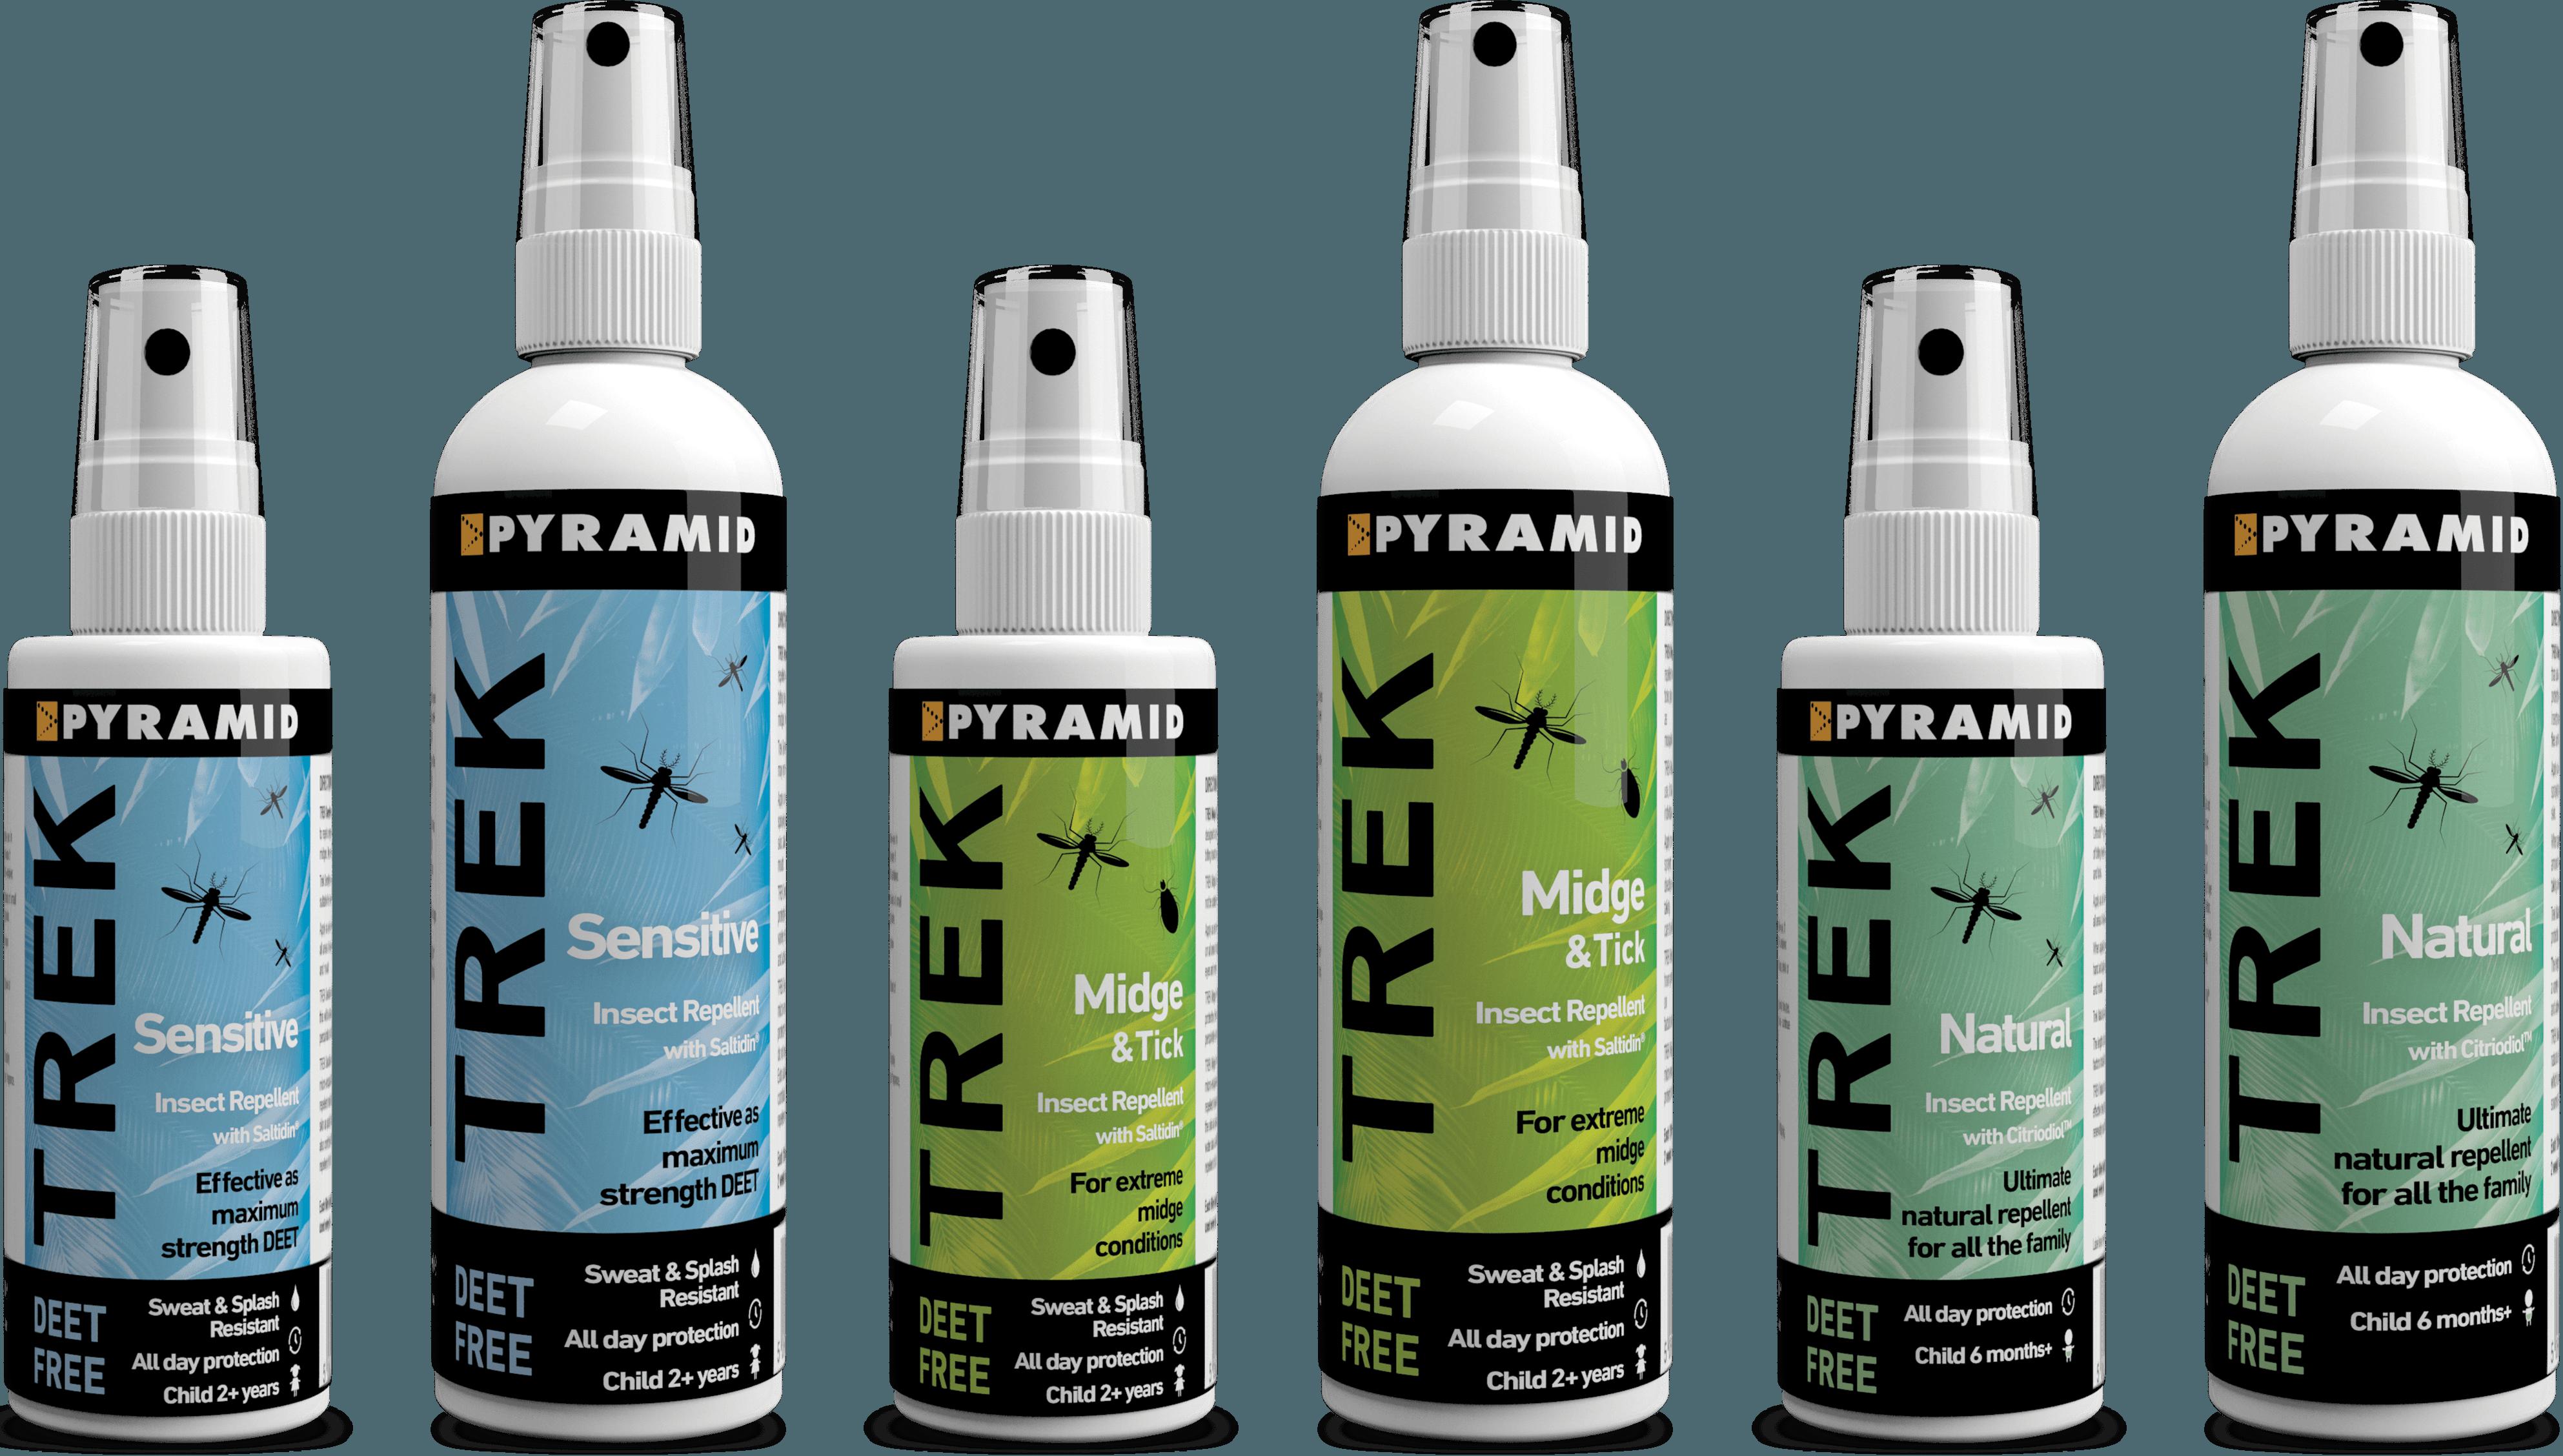 Pyramid-Trek-Natural-120ml-2